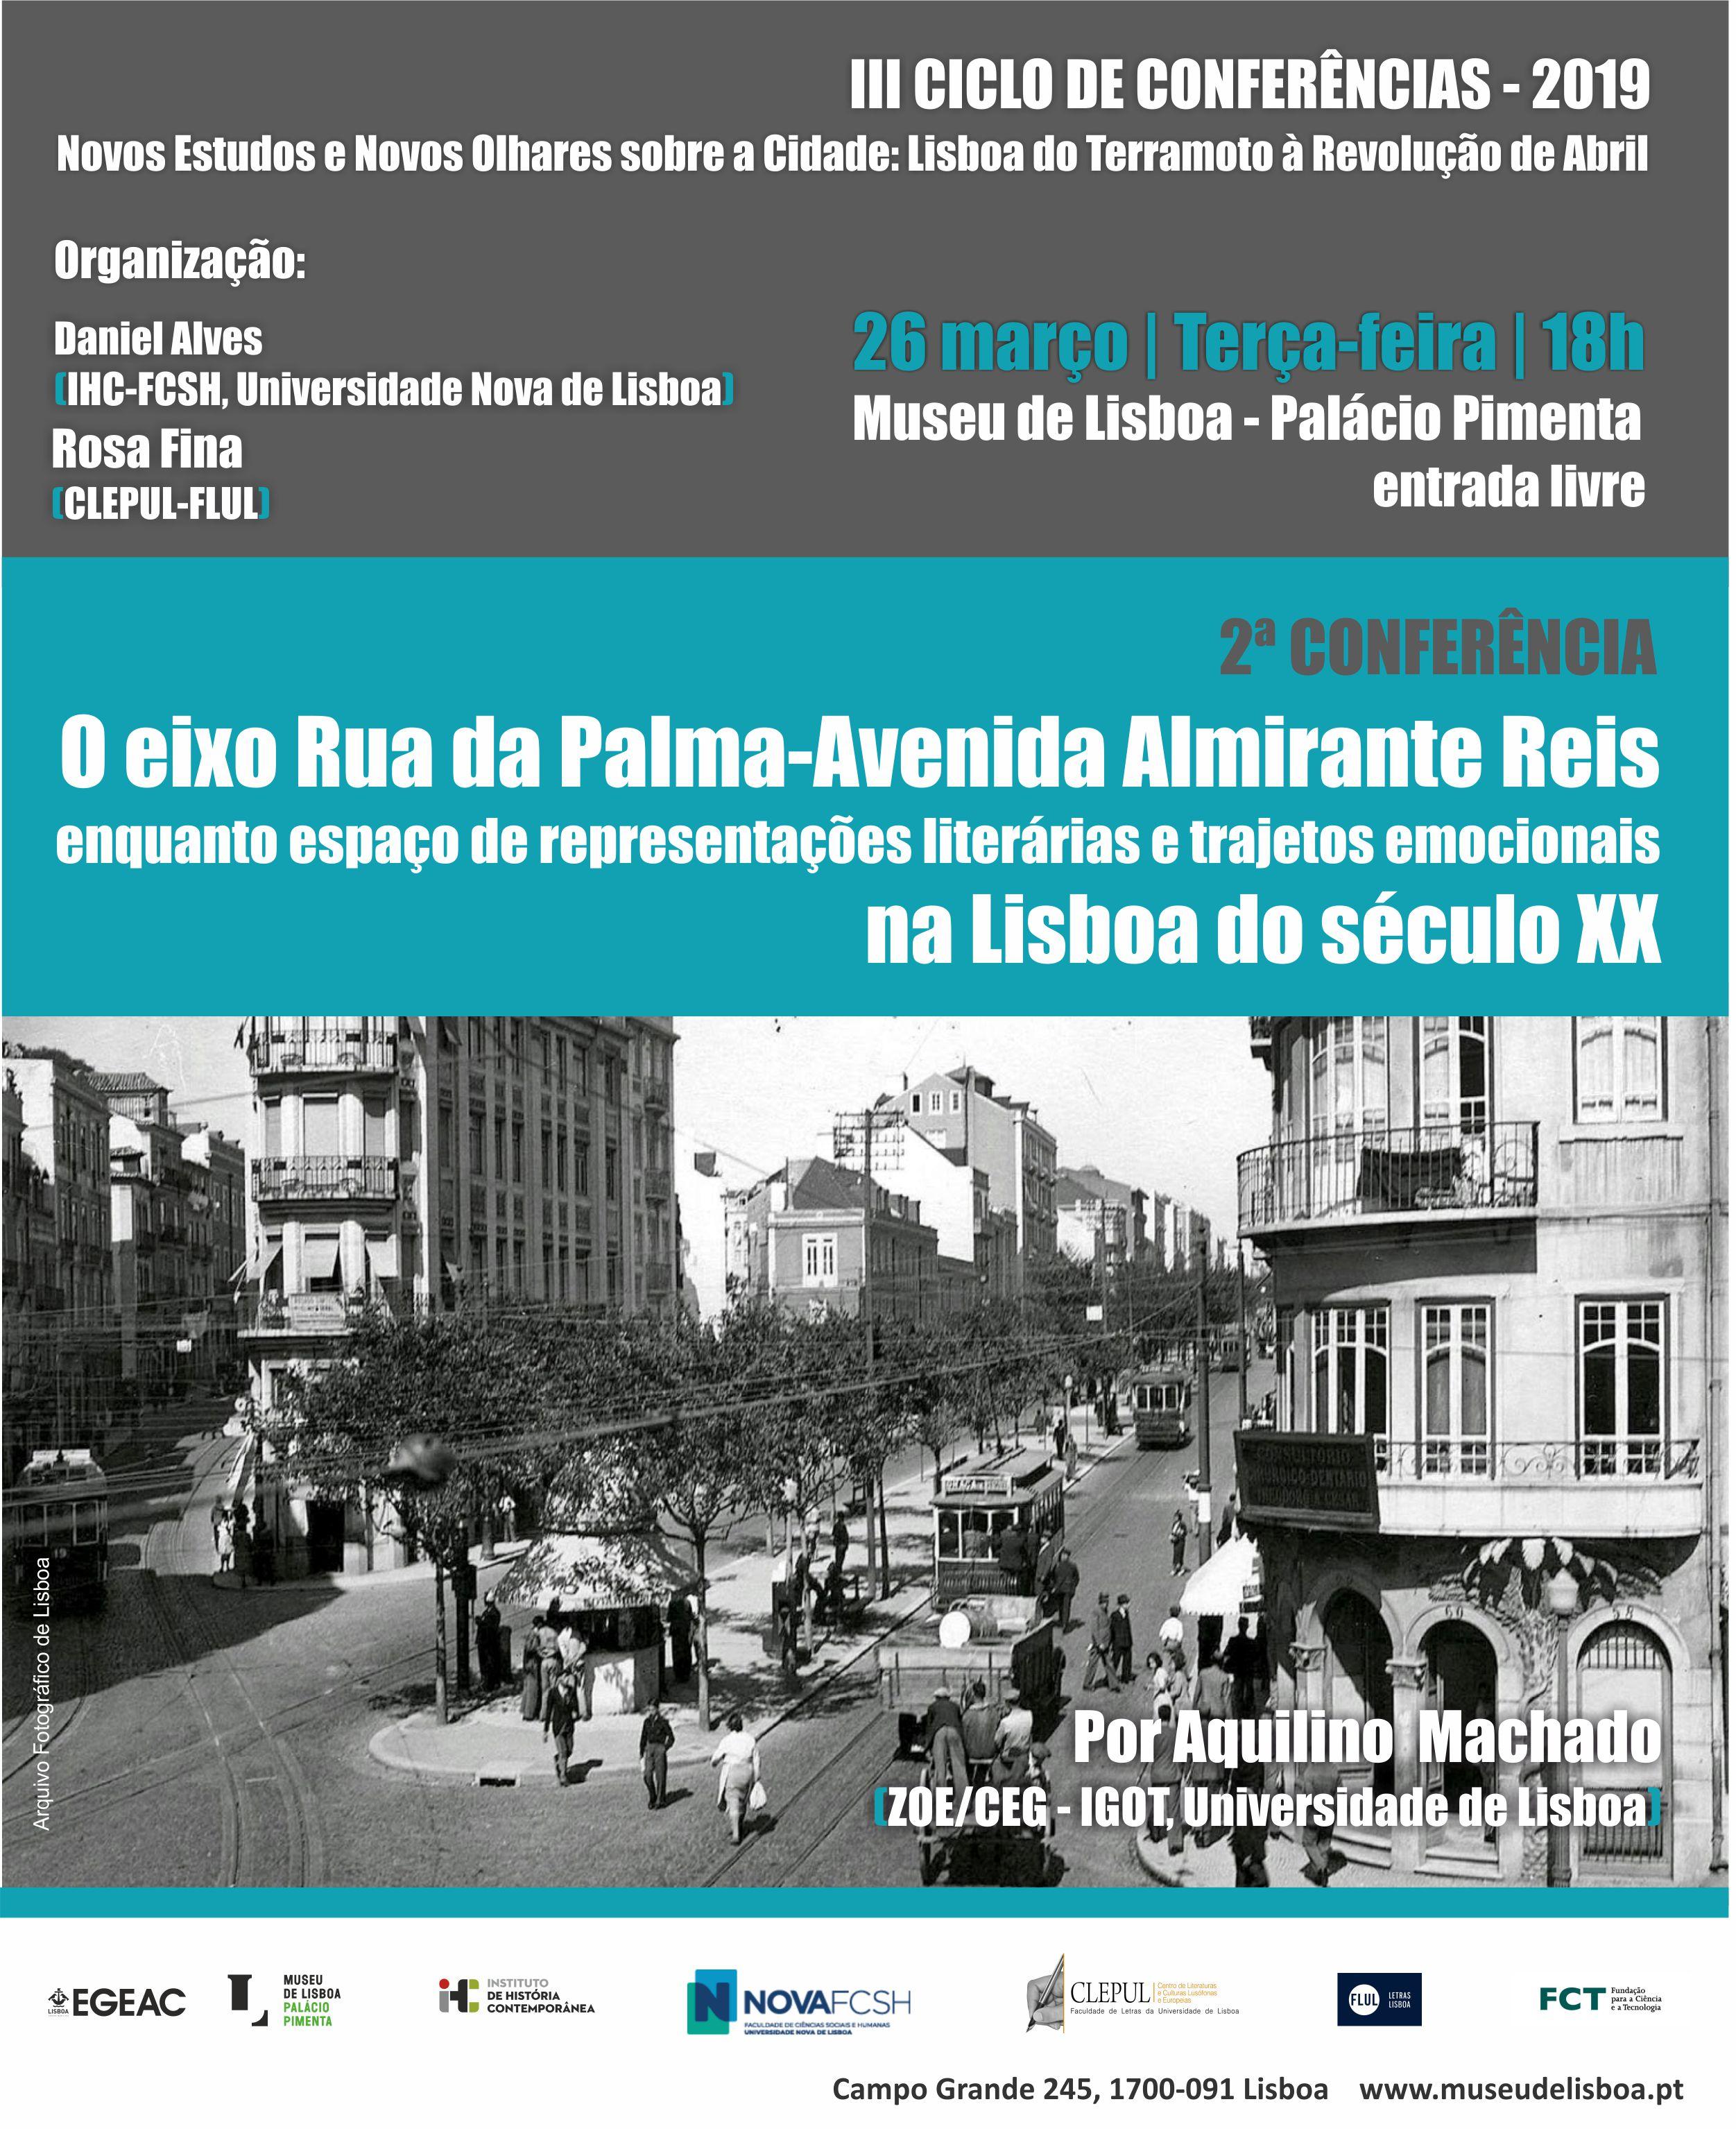 2ª conferência%2c Aquilino Machado